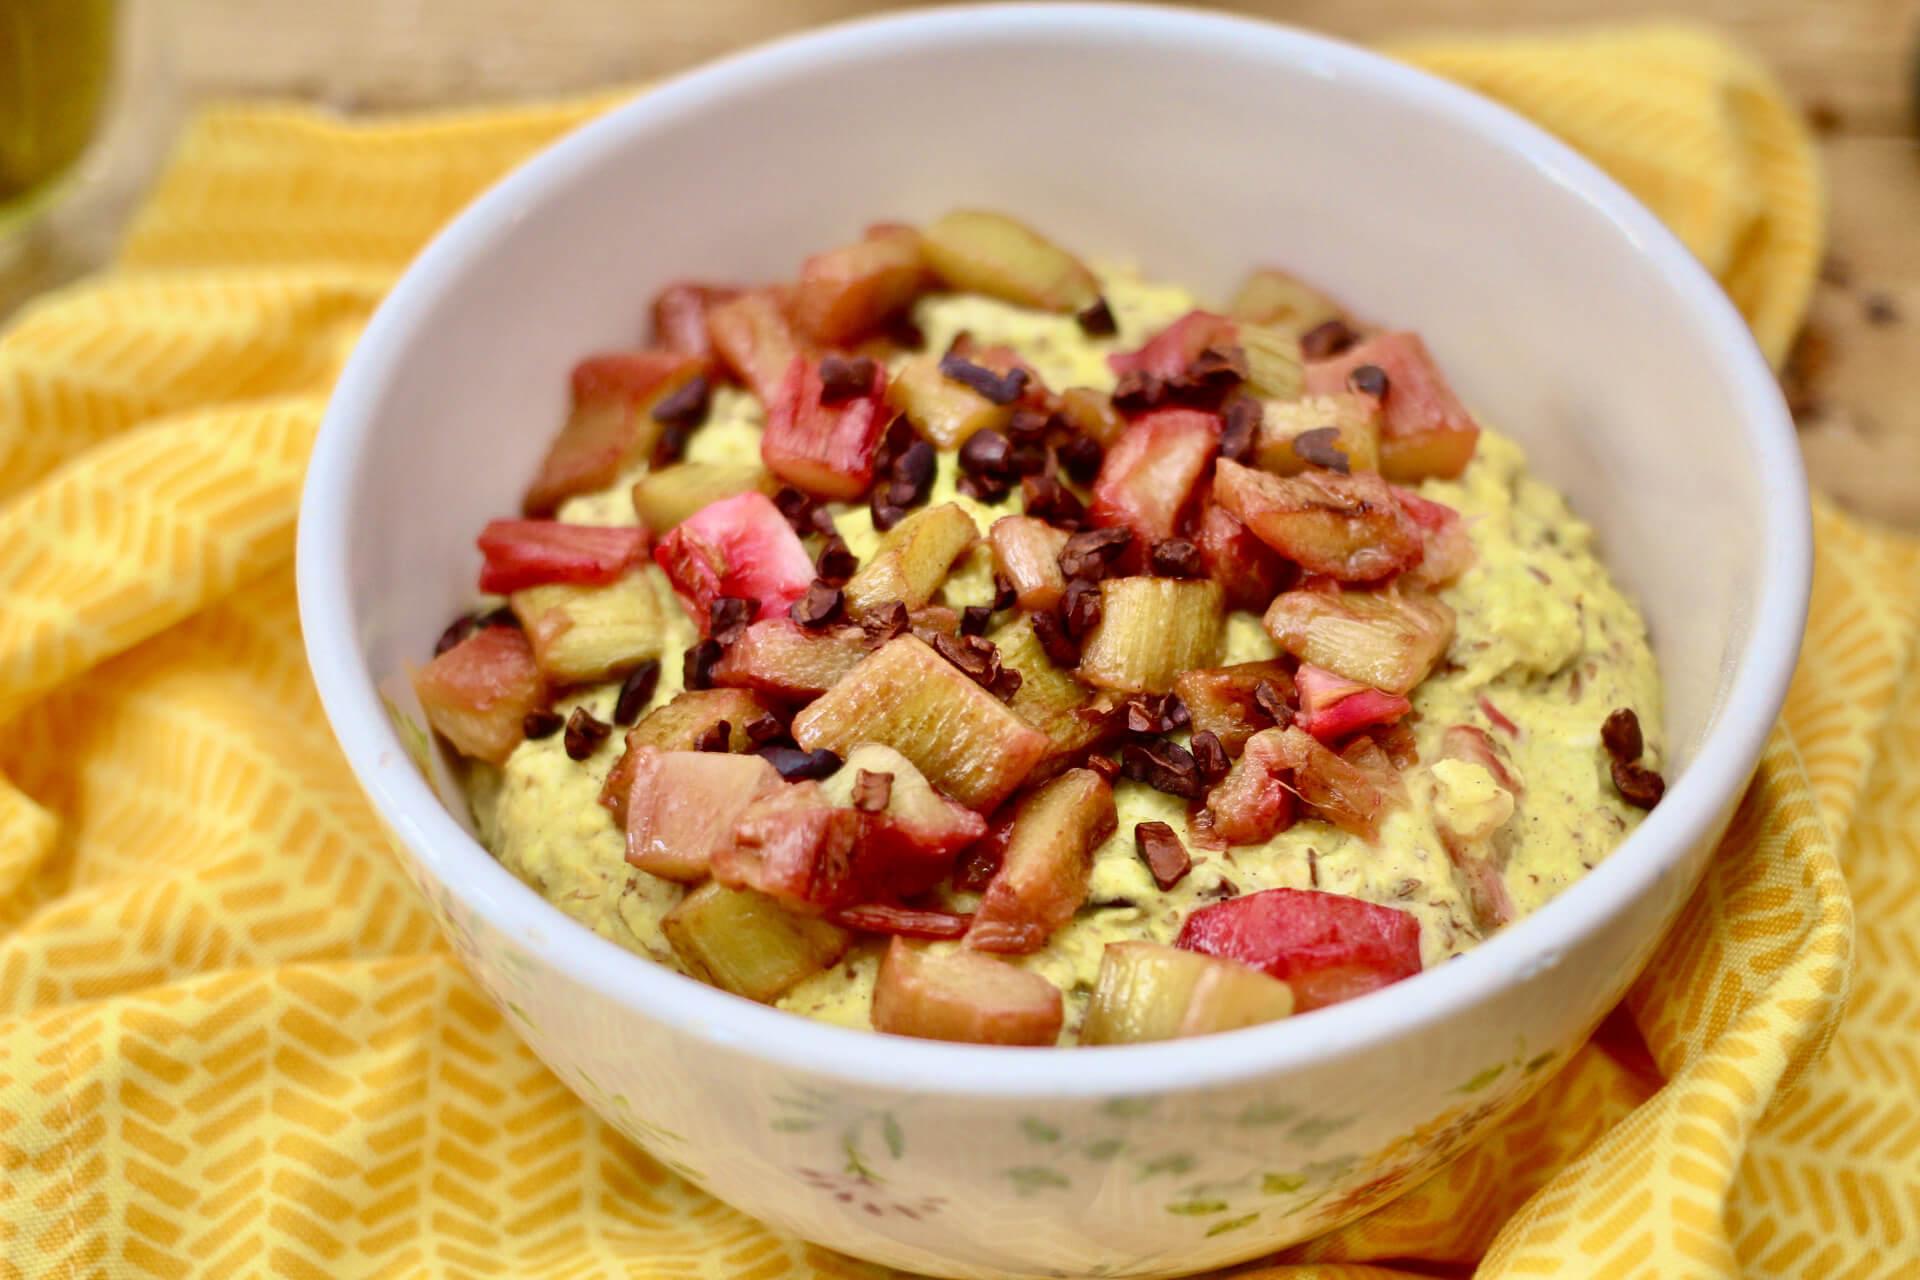 Rhabarber-Porridge